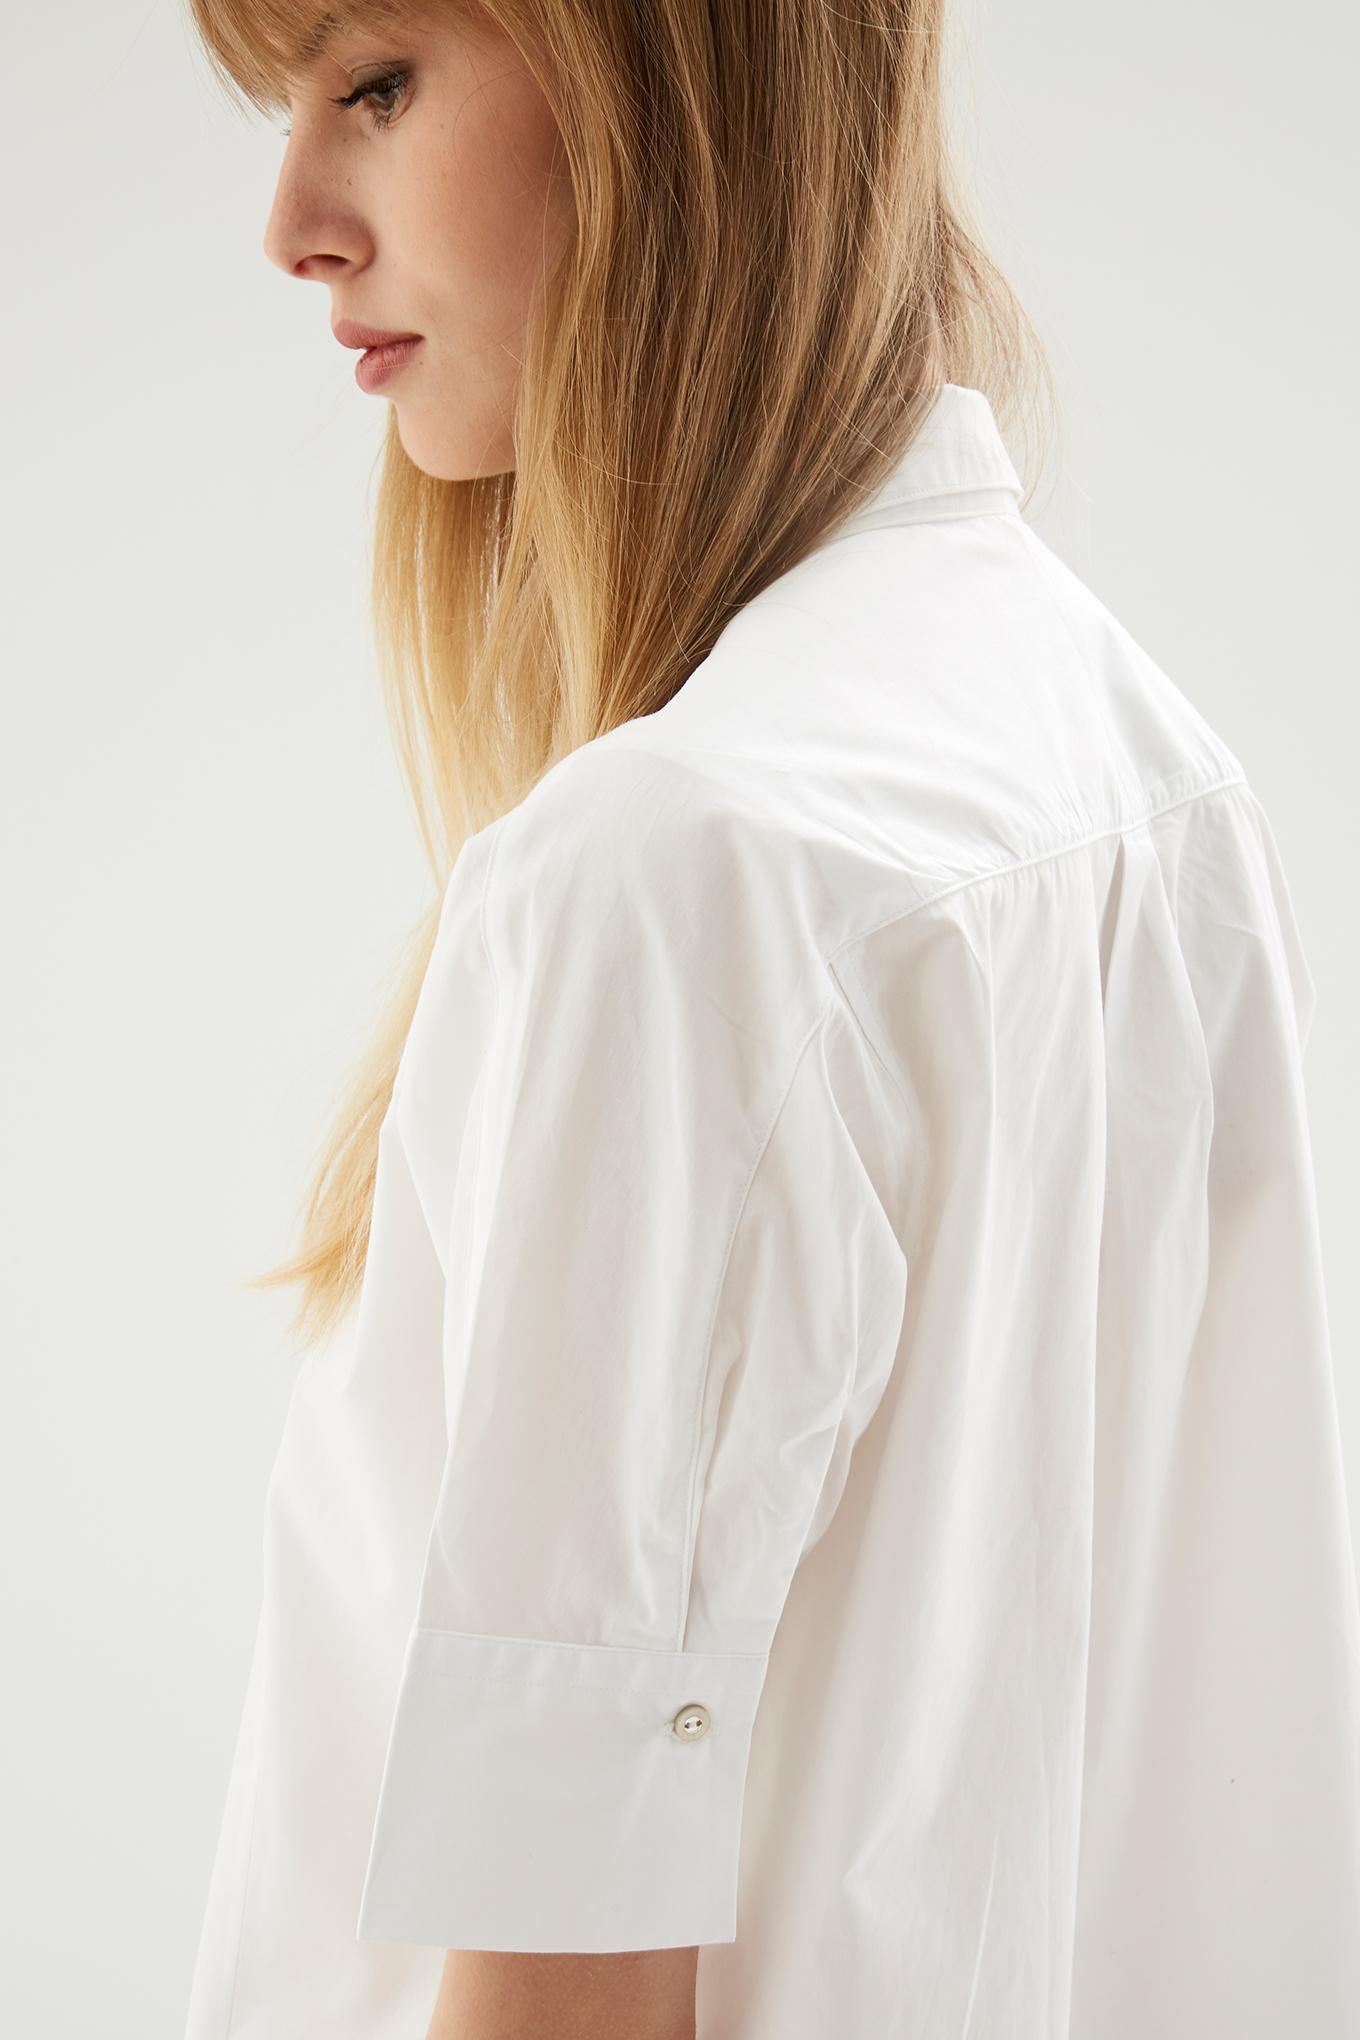 Camisa Branco Casual Mulher